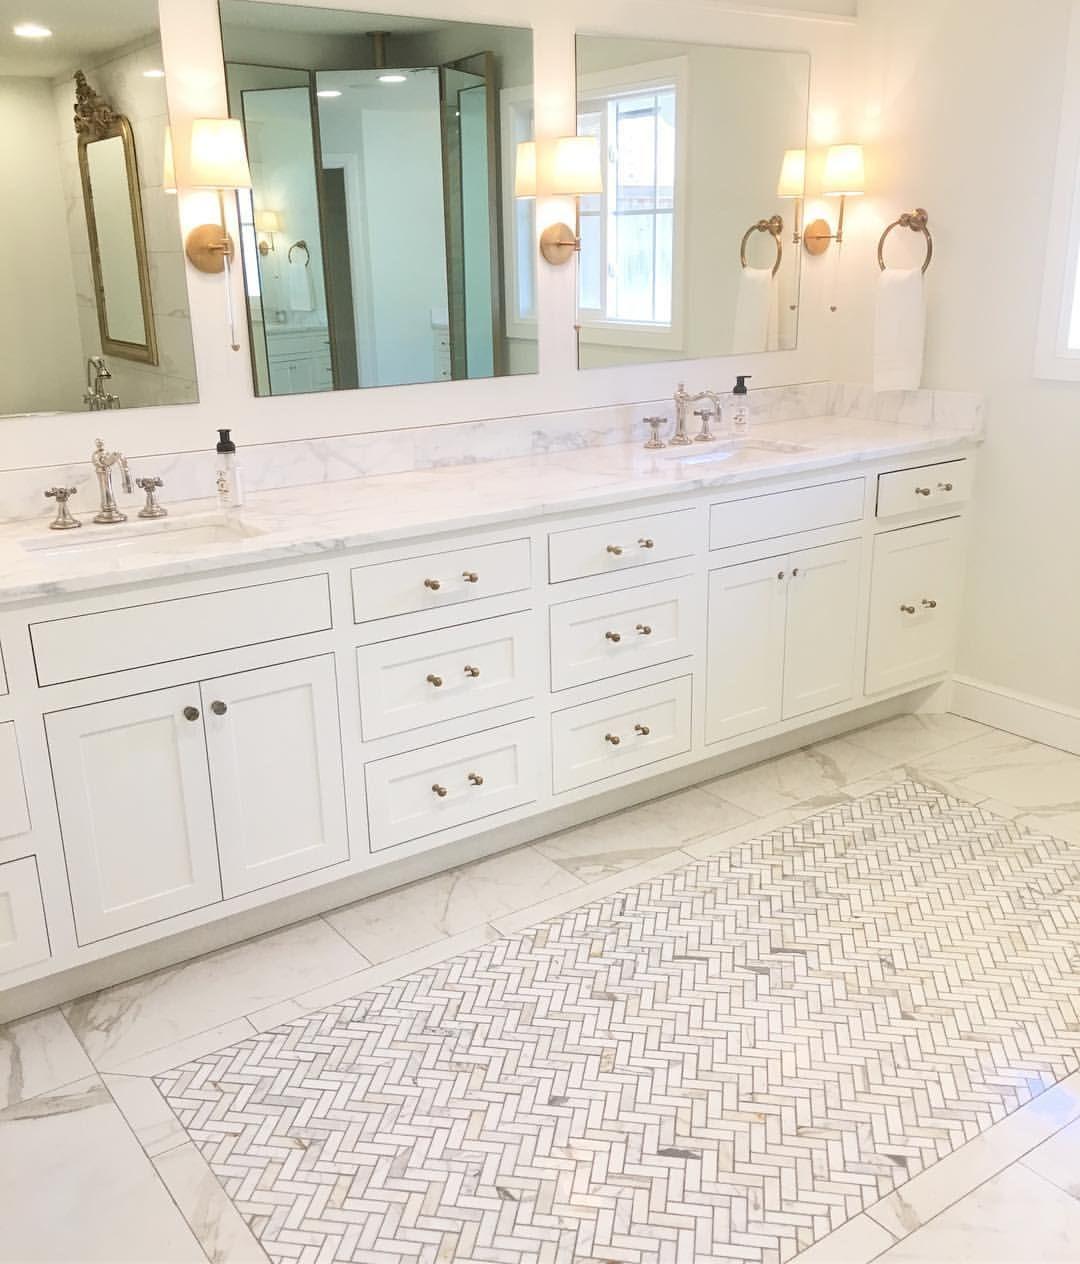 Bathroom Remodel Featuring Calacatta Marble Countertops The Field Tile Is Our Imarmi Series Porcelain T Fliesenboden Badezimmerfliesen Badezimmer Fliesen